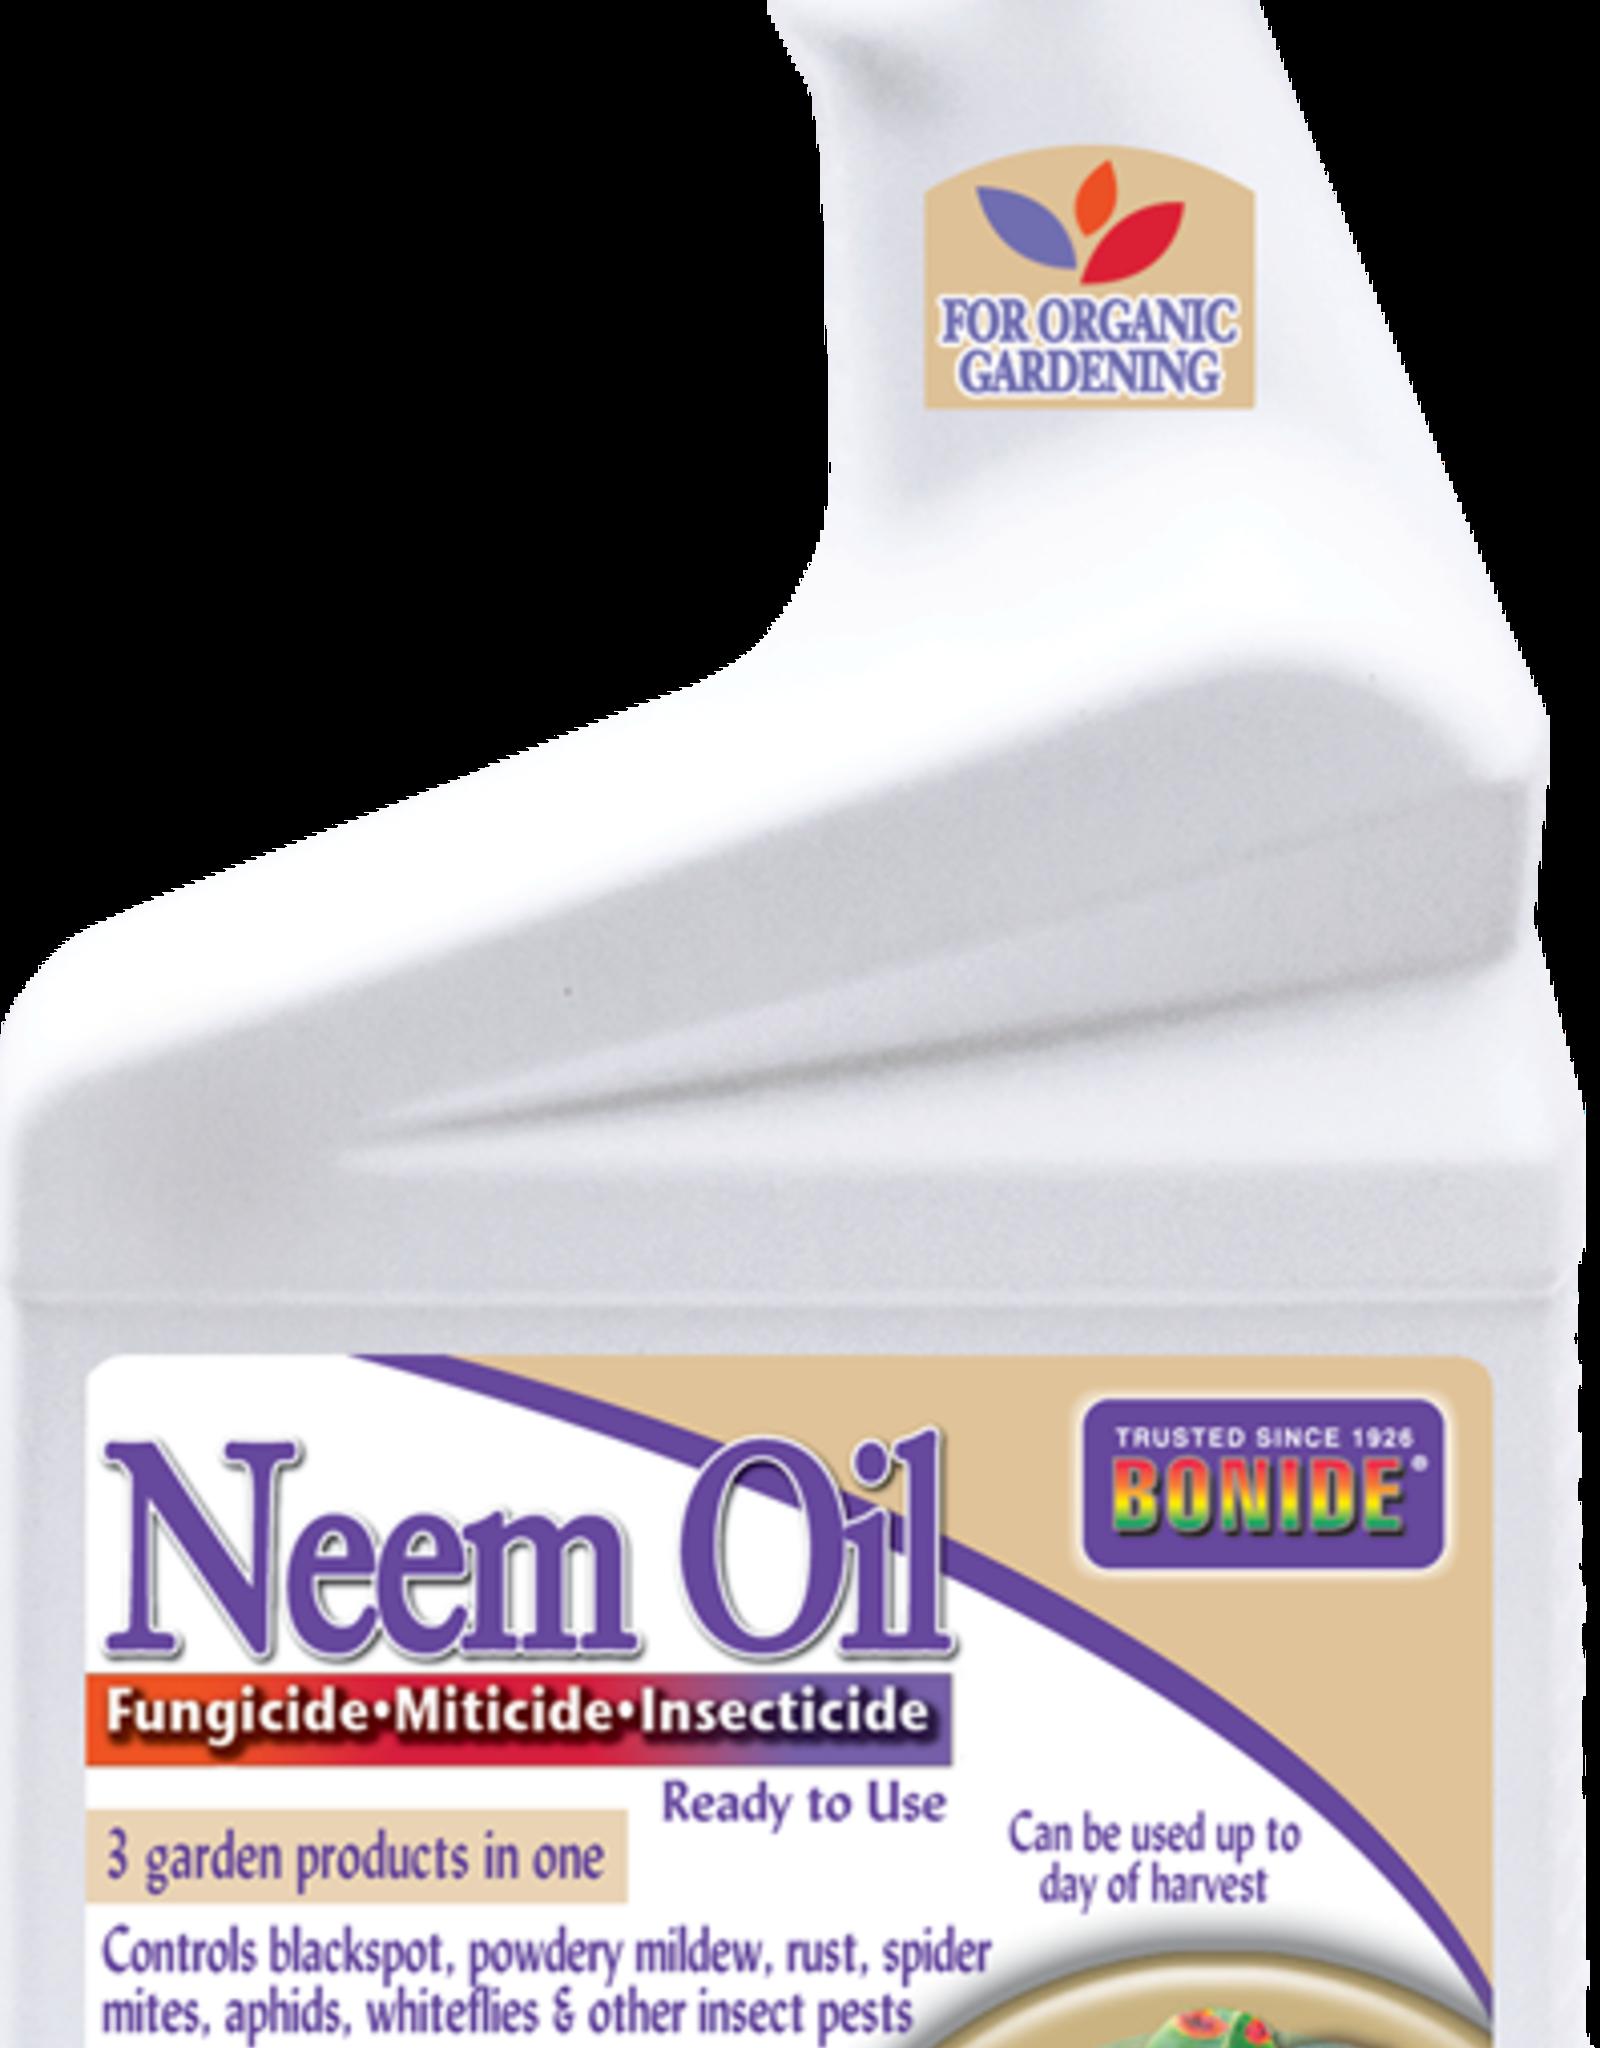 BONIDE PRODUCTS INC     P BONIDE NEEM OIL (READY TO USE) 32OZ